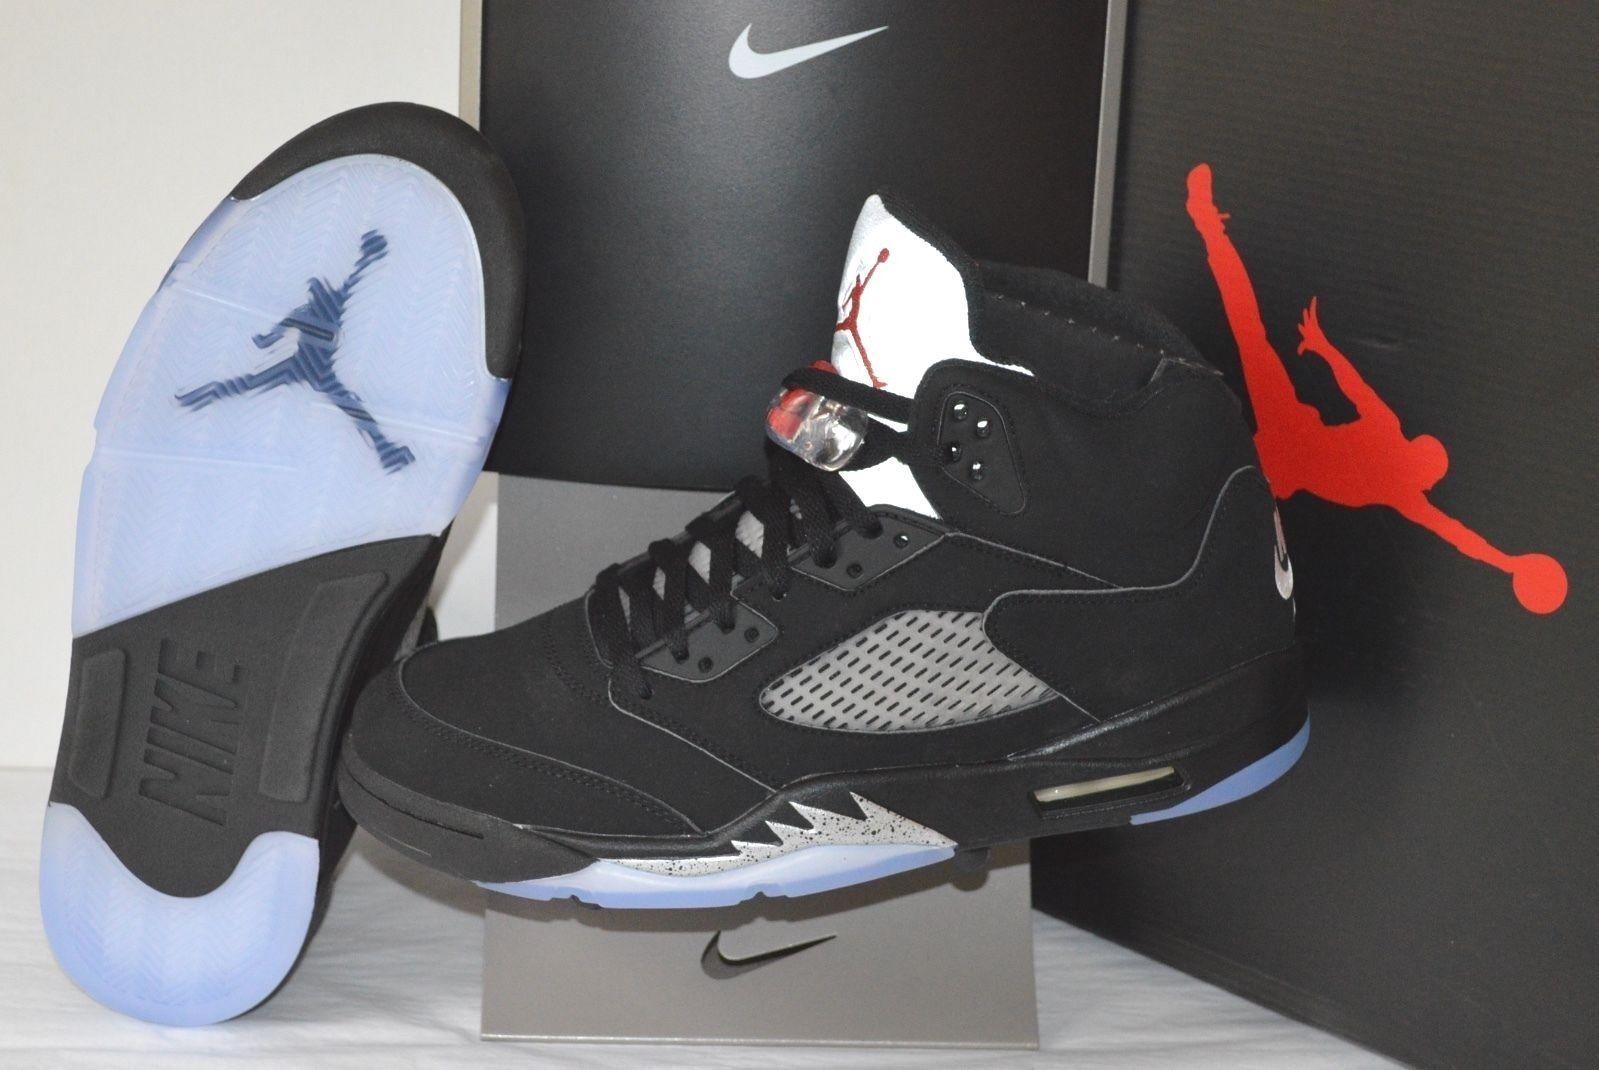 sale retailer 67d03 d8218 Nike Air Jordan V 5 Black Metallic 2016 OG Retro Size 11 for sale ...